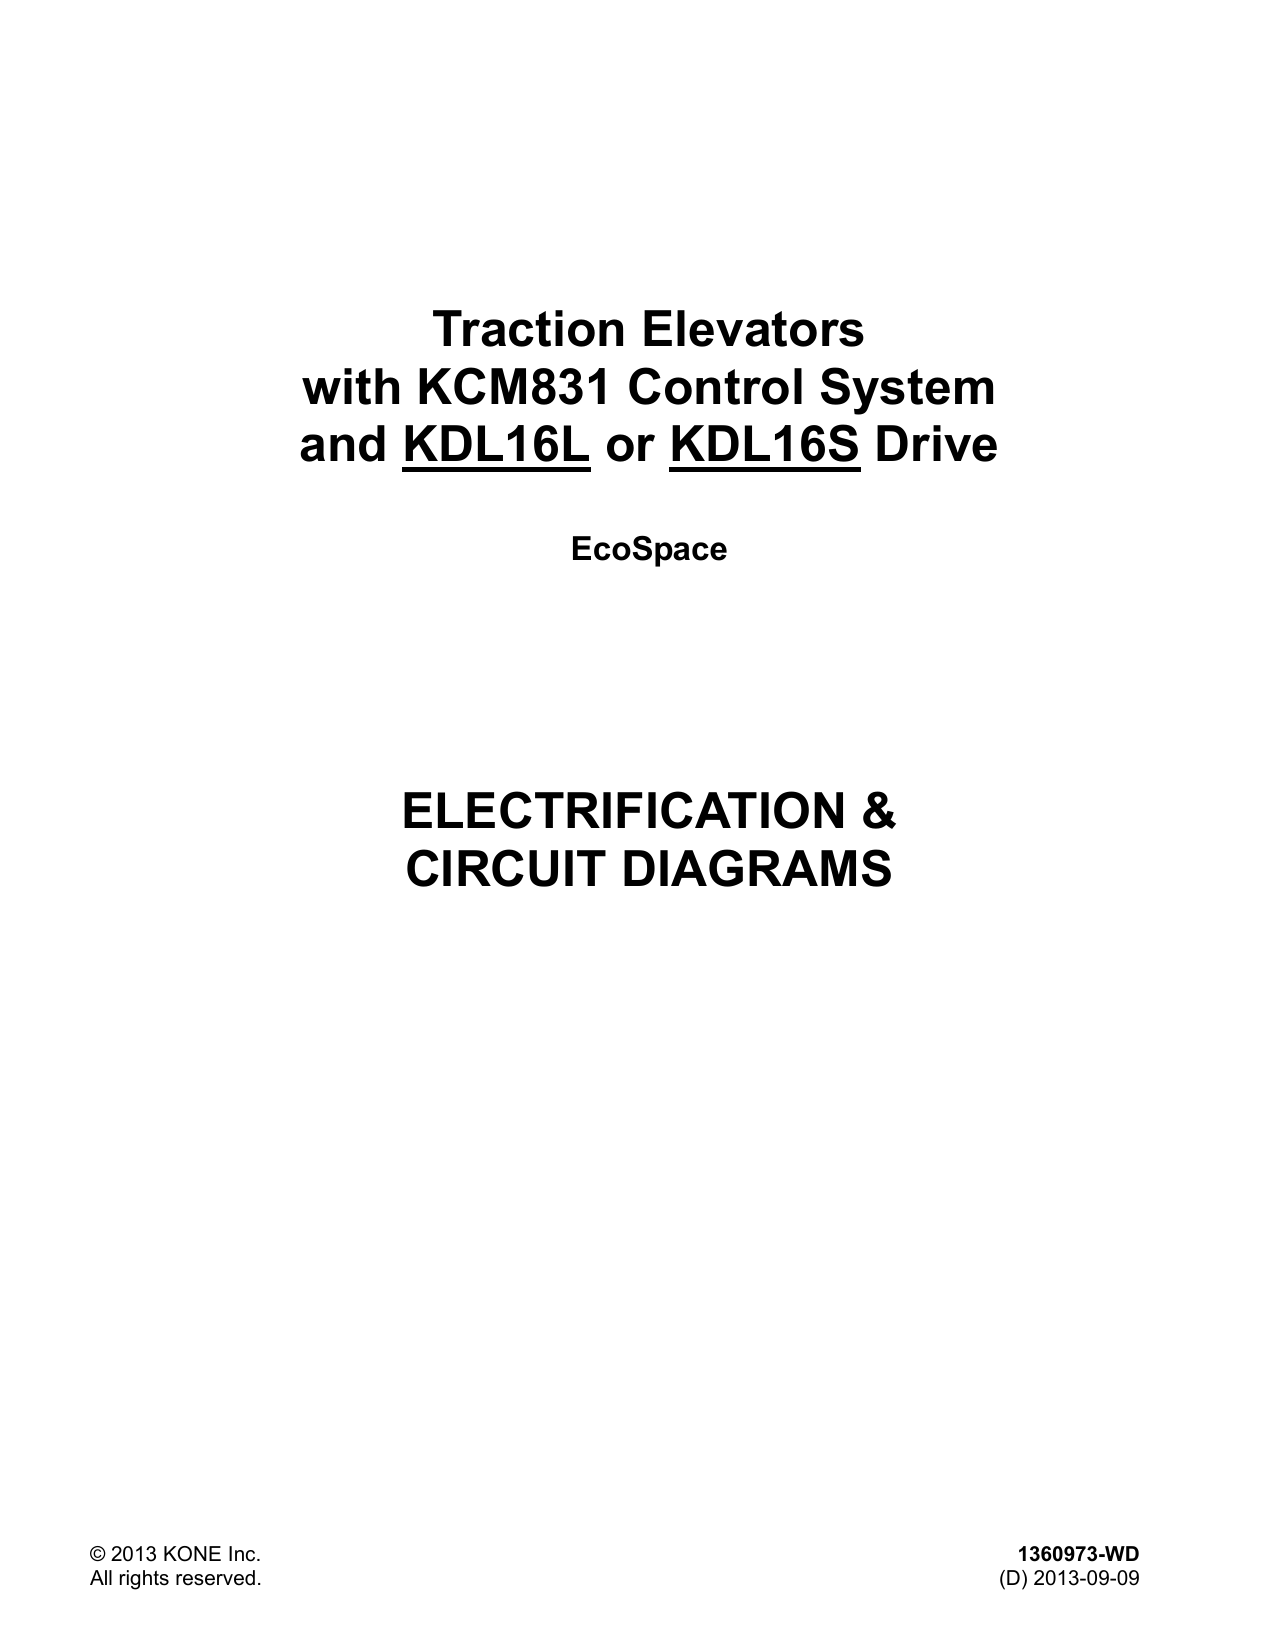 proform trainer 7.0 elliptical manual